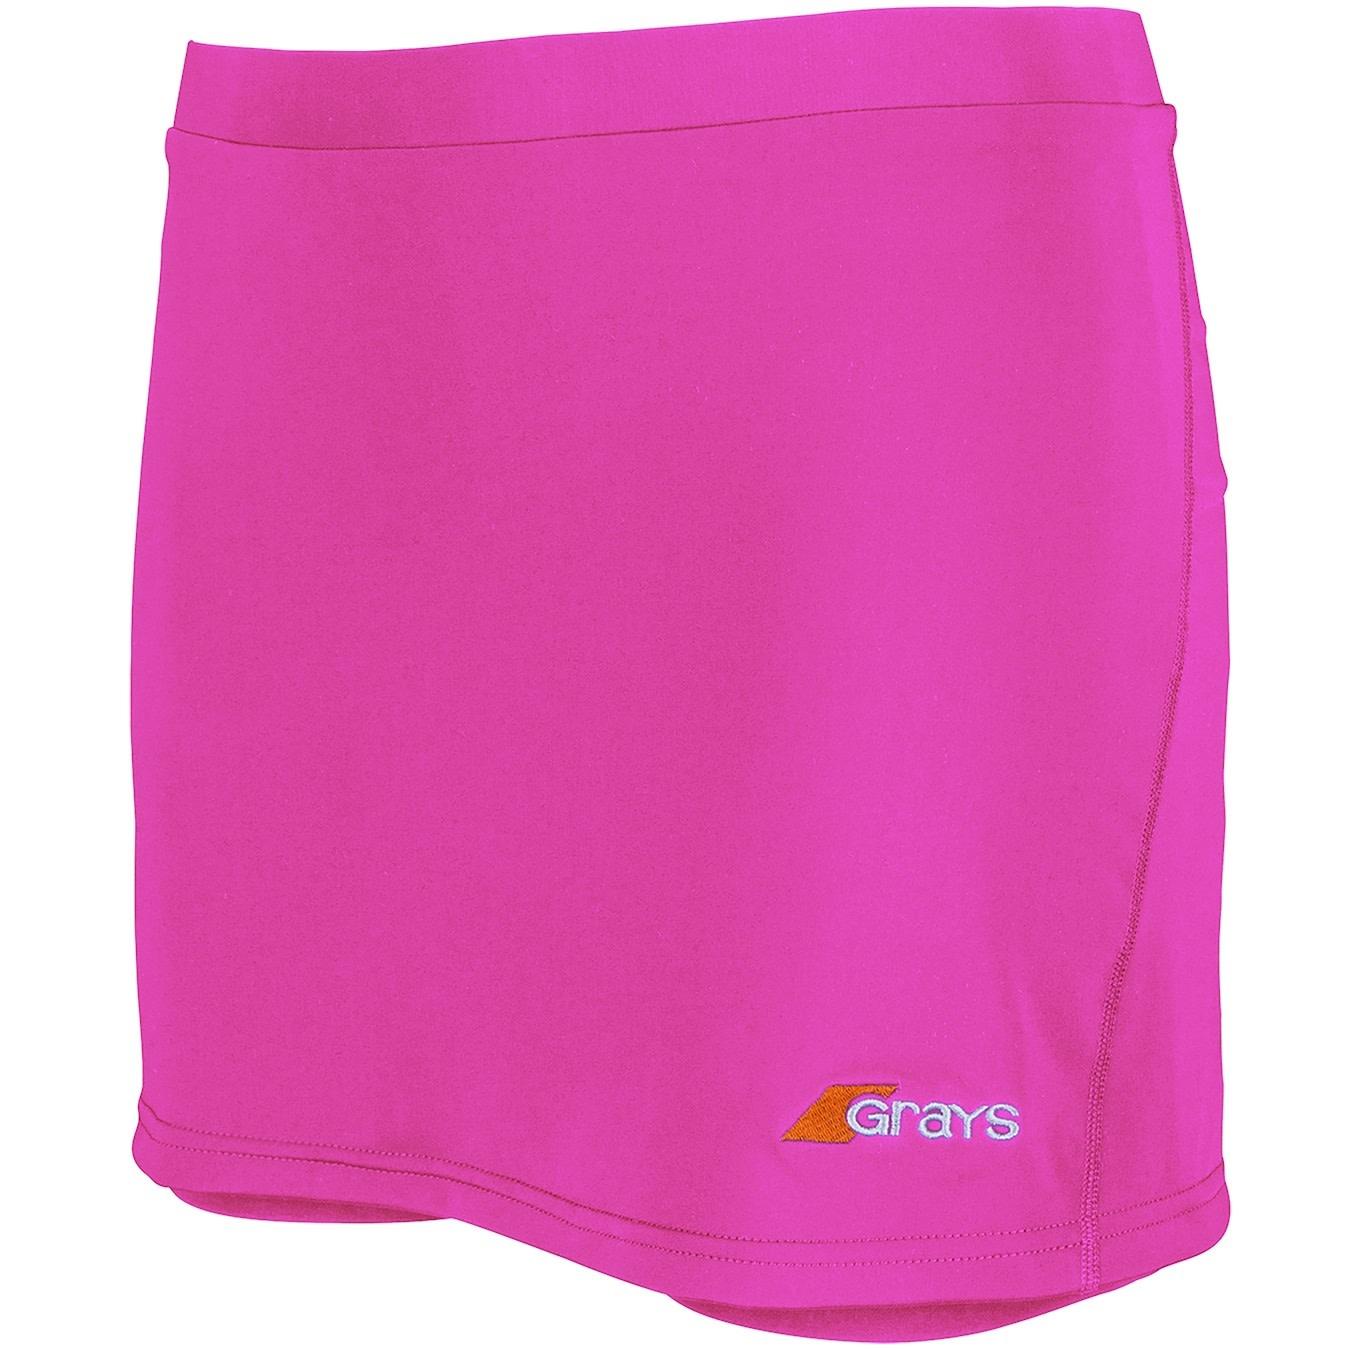 Grays Grays rokje dames fluo pink